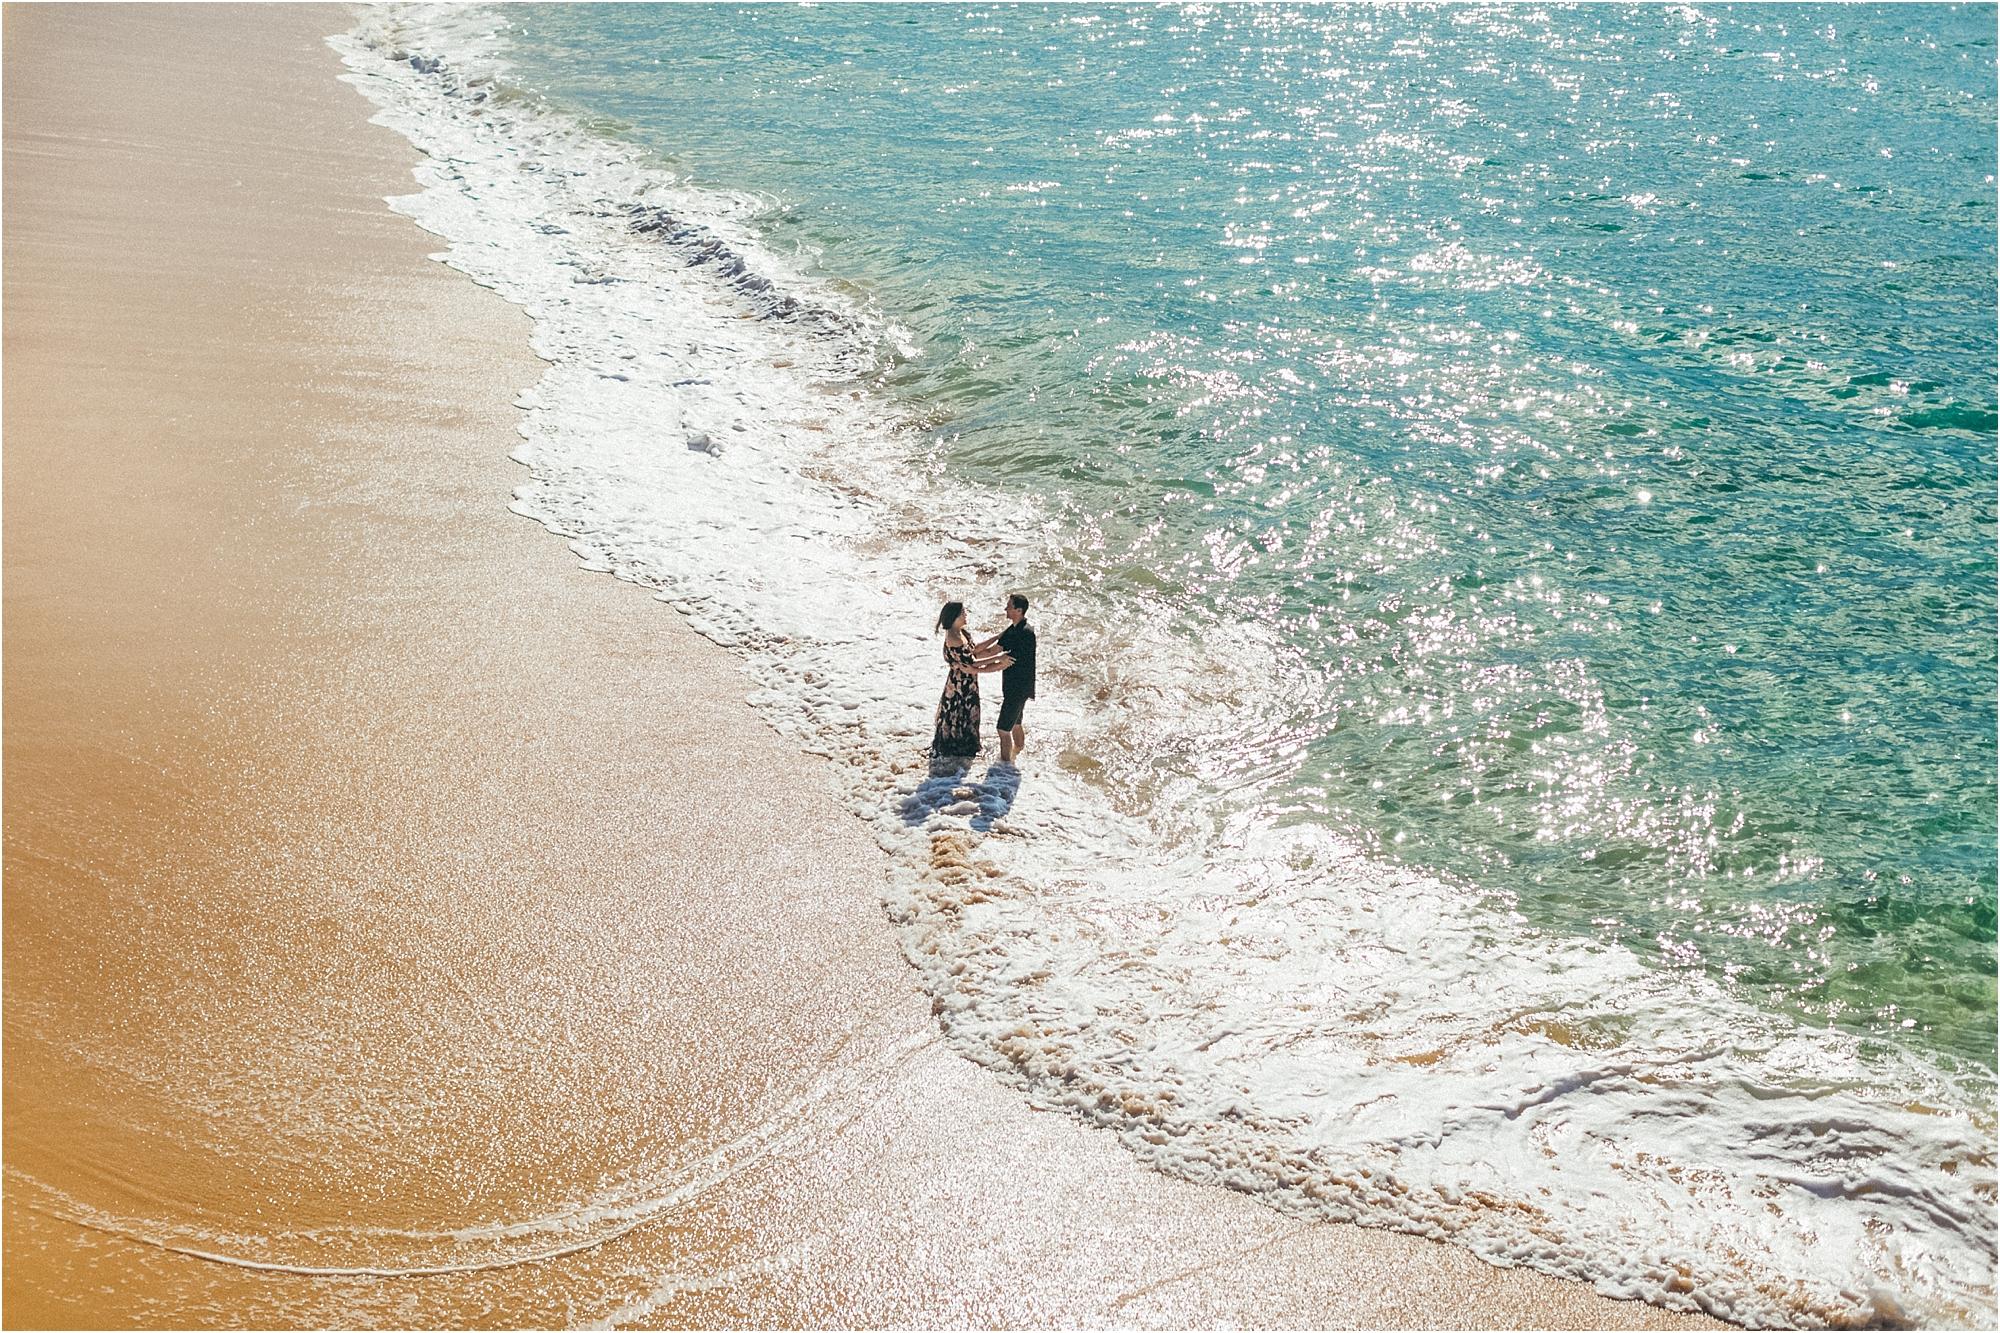 angie-diaz-photography-maui-hawaii-engagement-wedding-photographer_0021.jpg